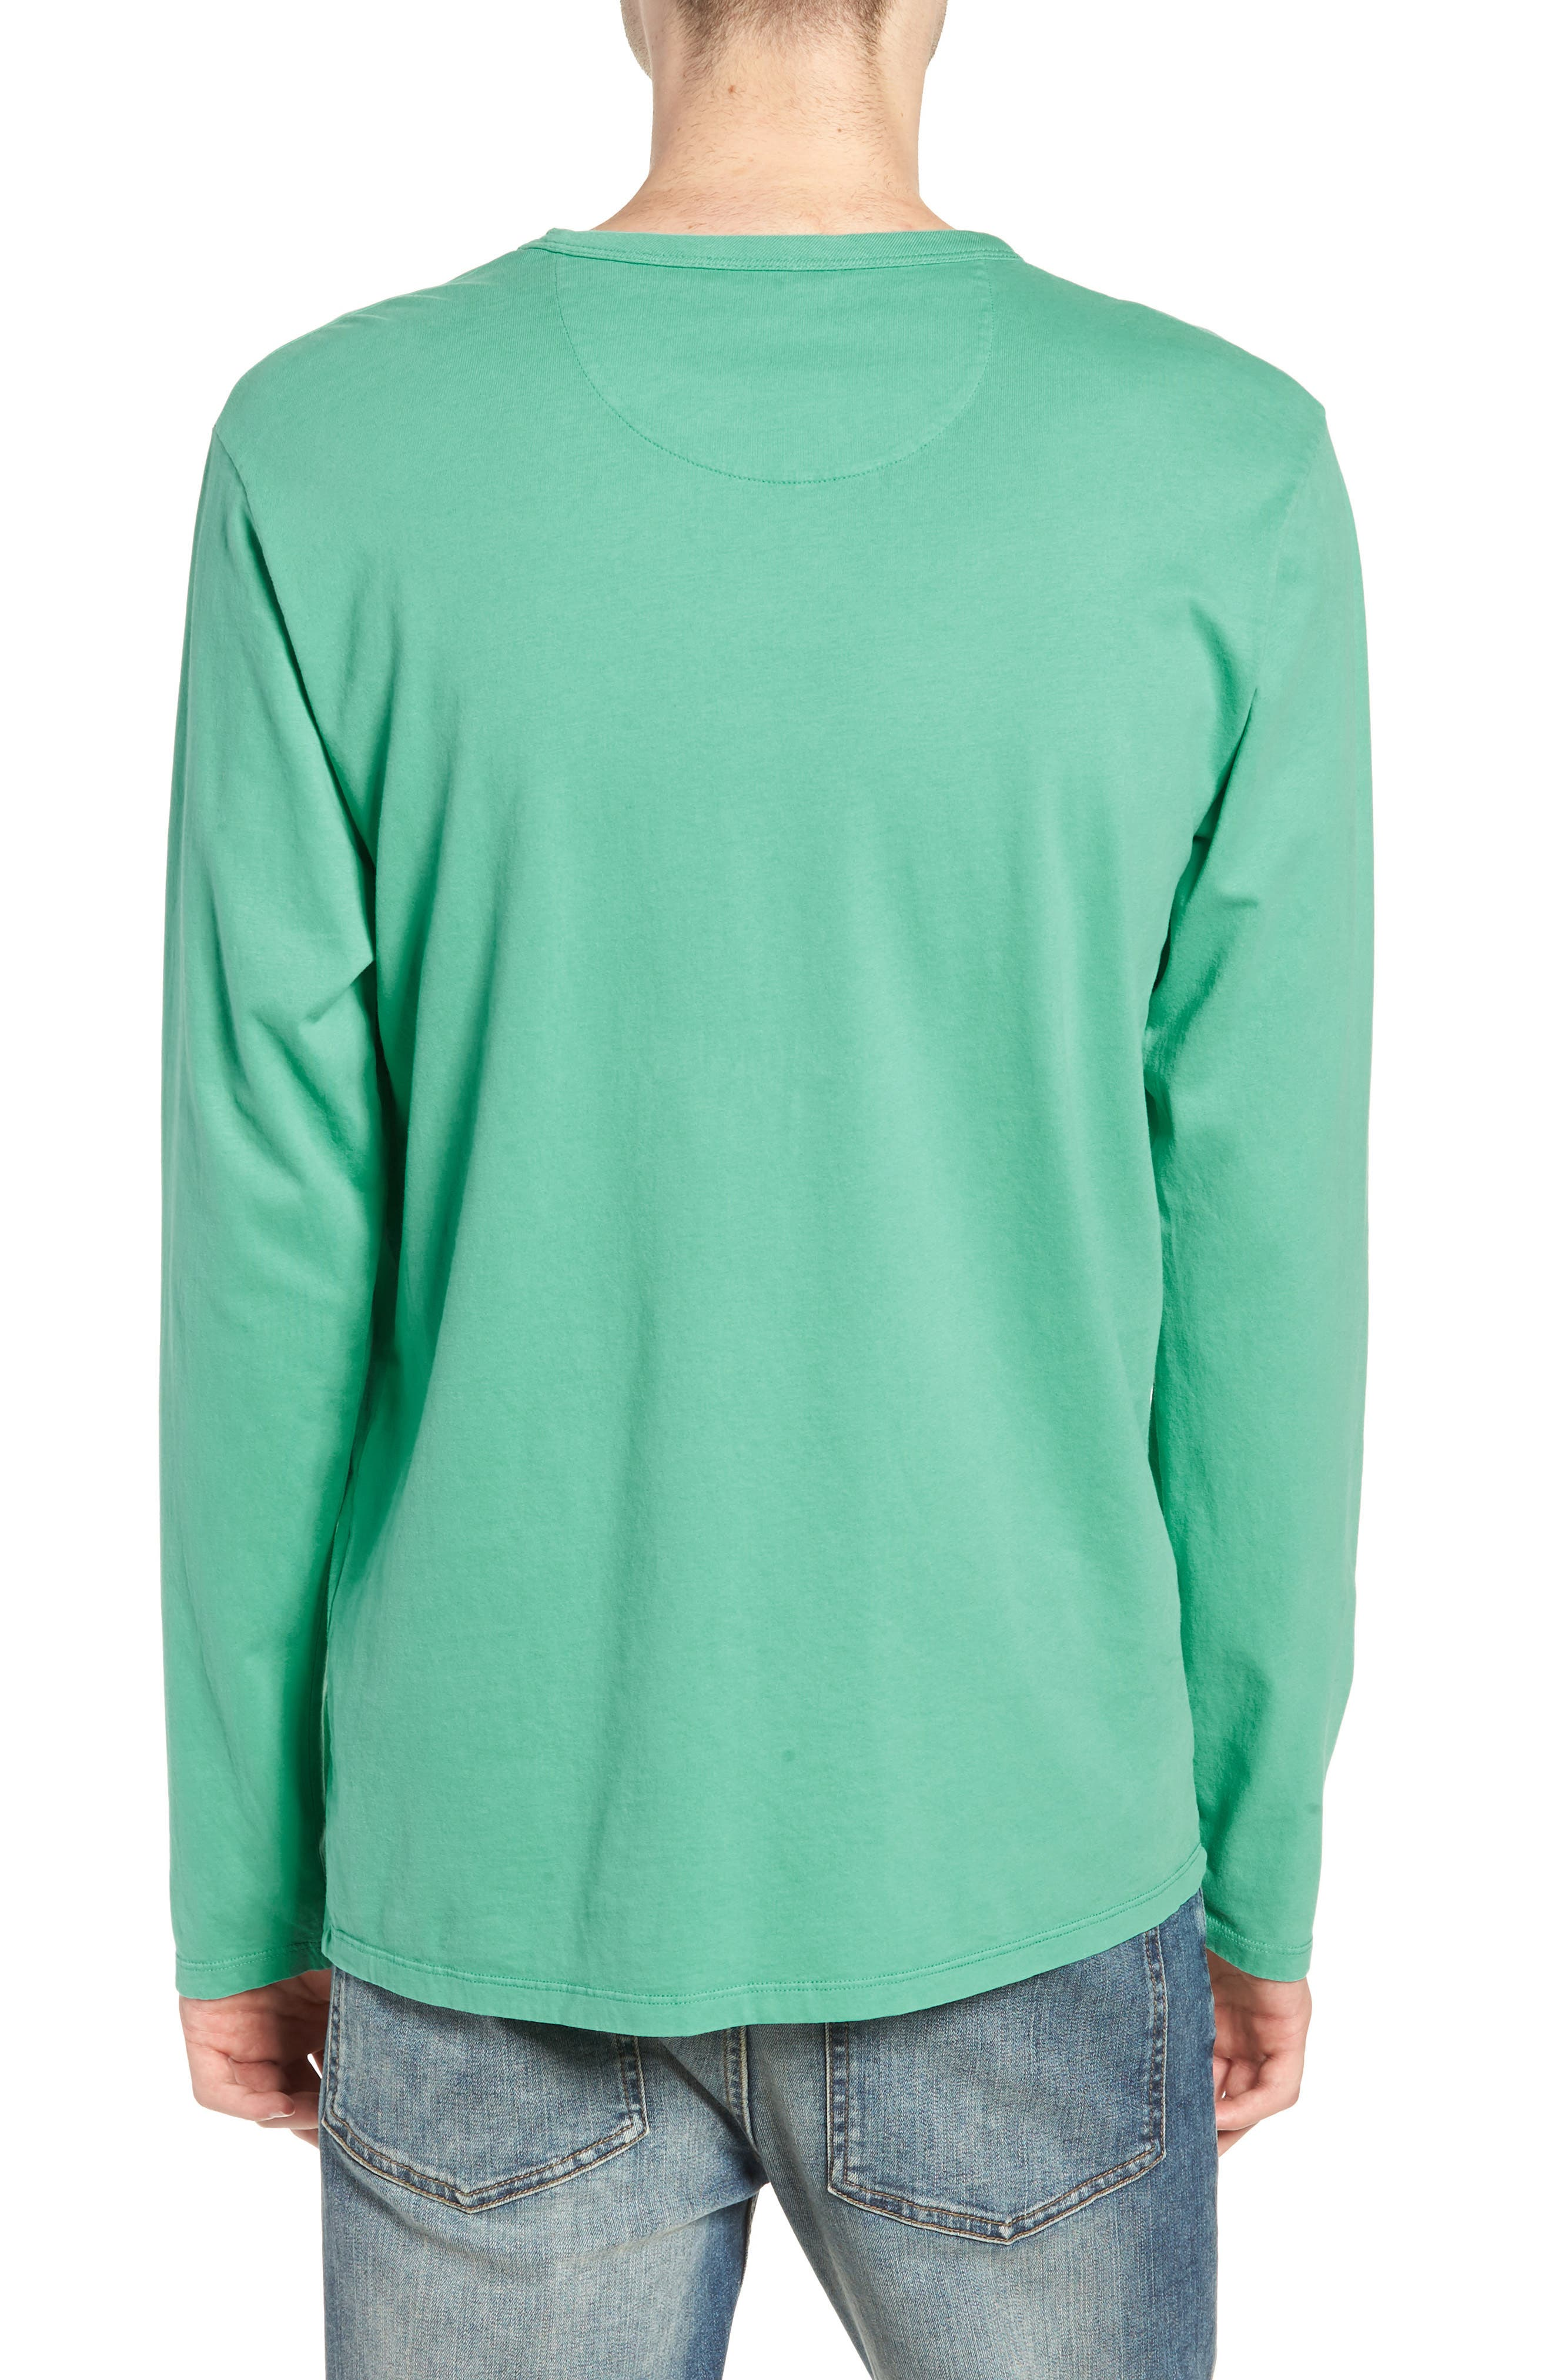 James Pima Long Sleeve Pocket T-Shirt,                             Alternate thumbnail 2, color,                             SEAFOAM GREEN